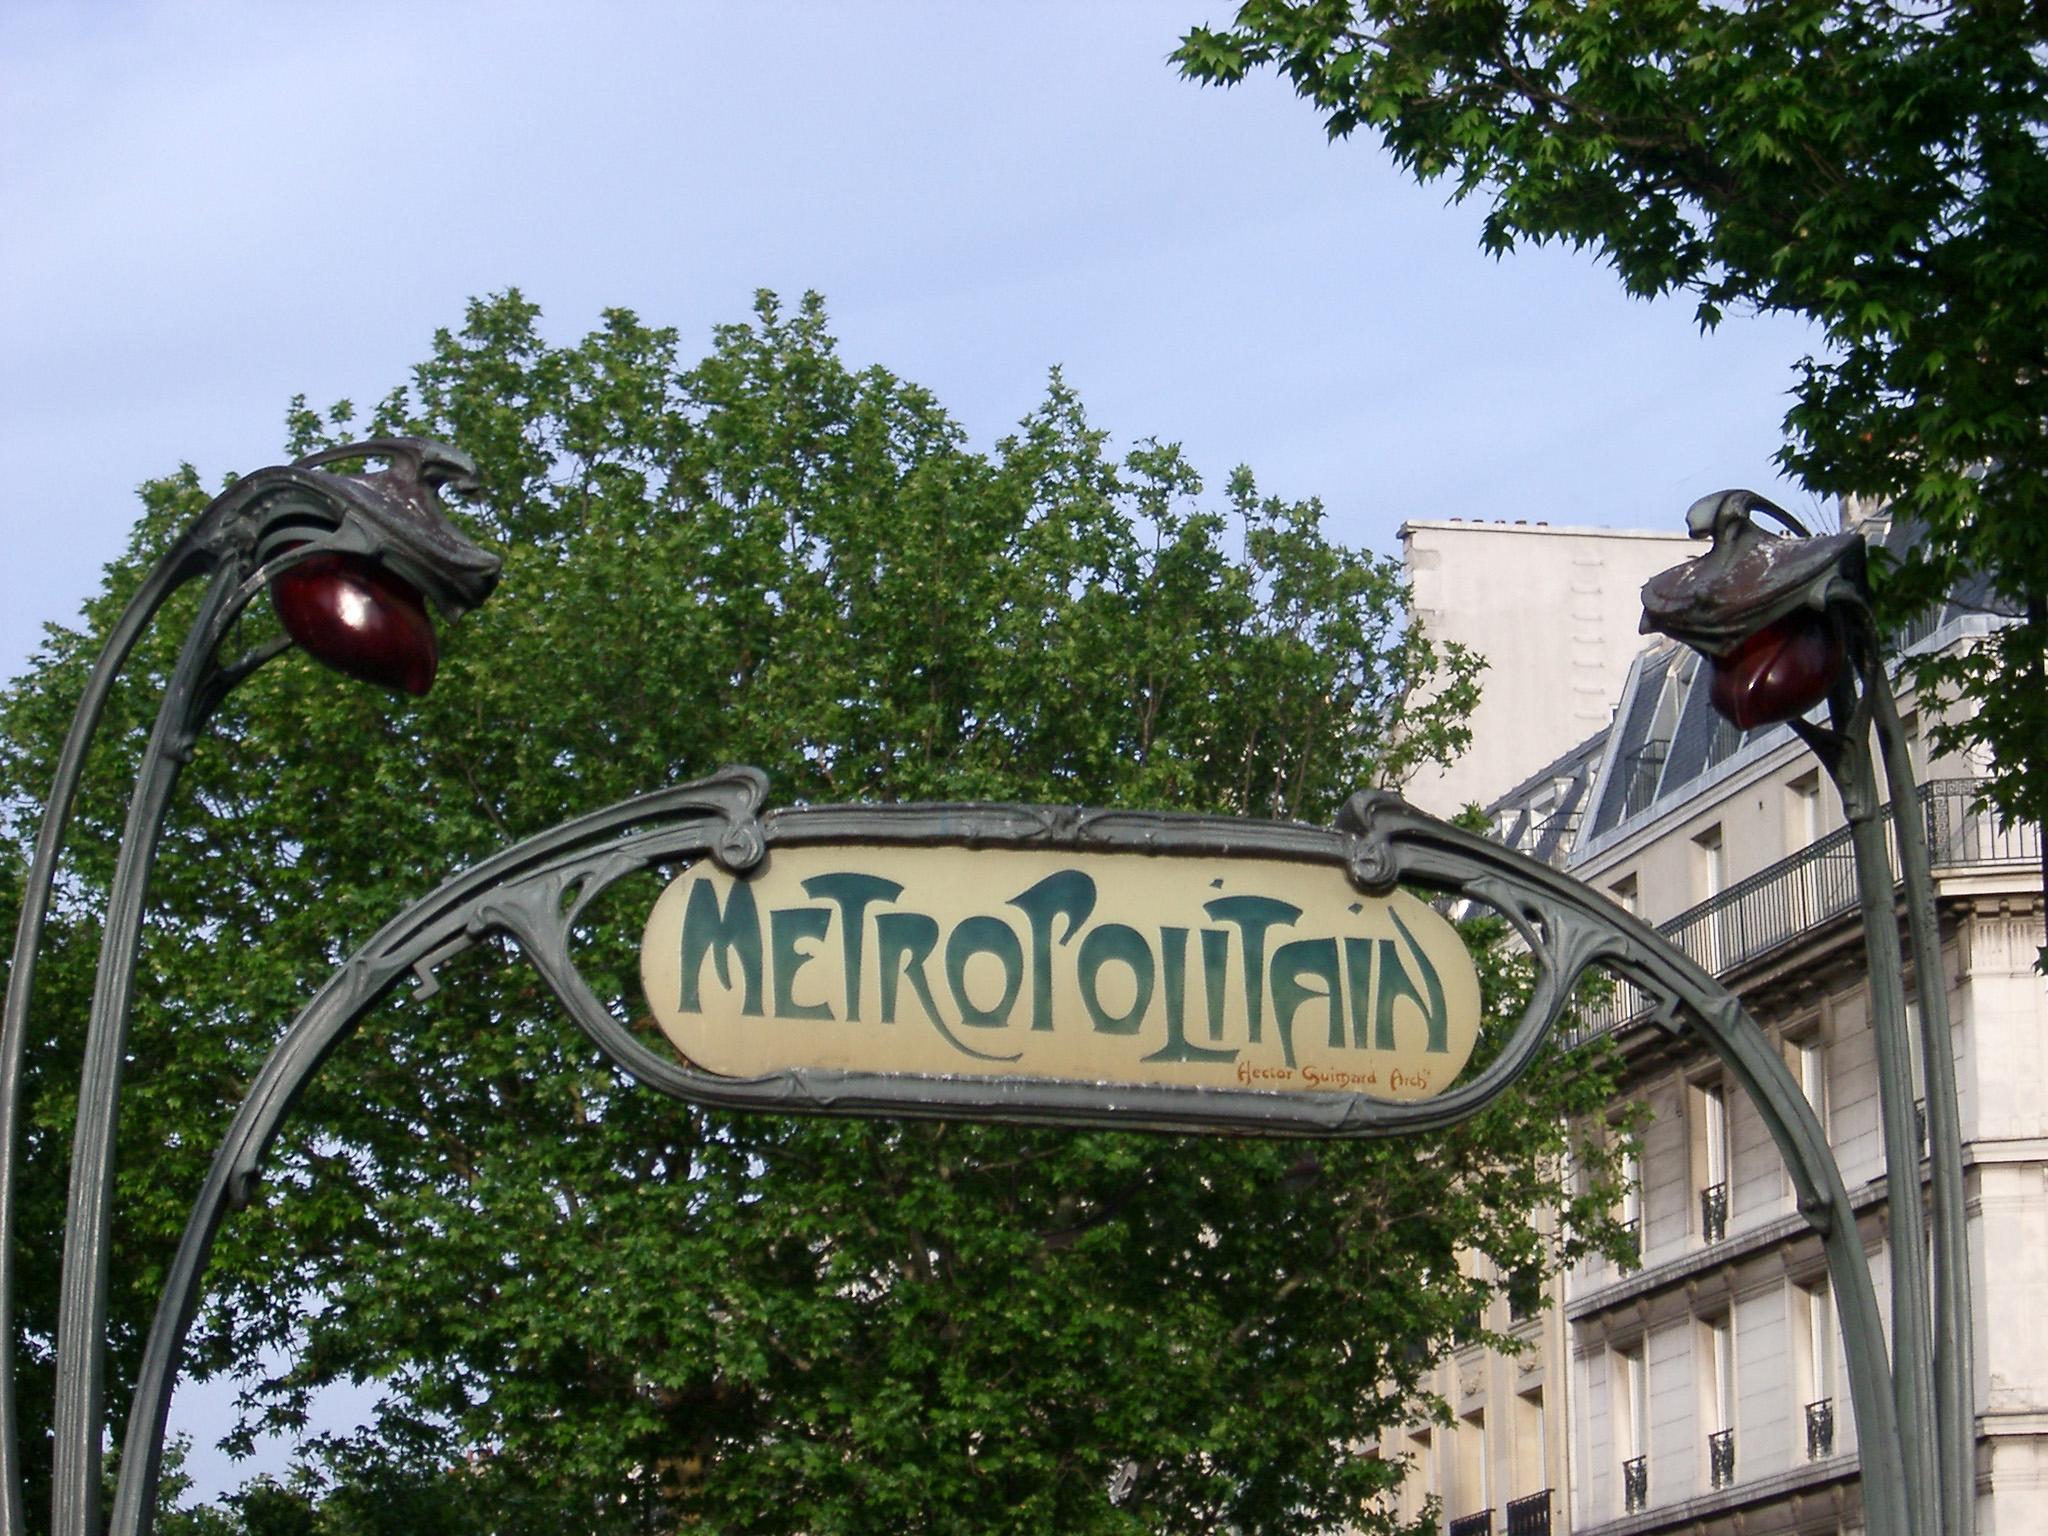 Free Stock photo of Art Deco Paris Metro sign | Photoeverywhere